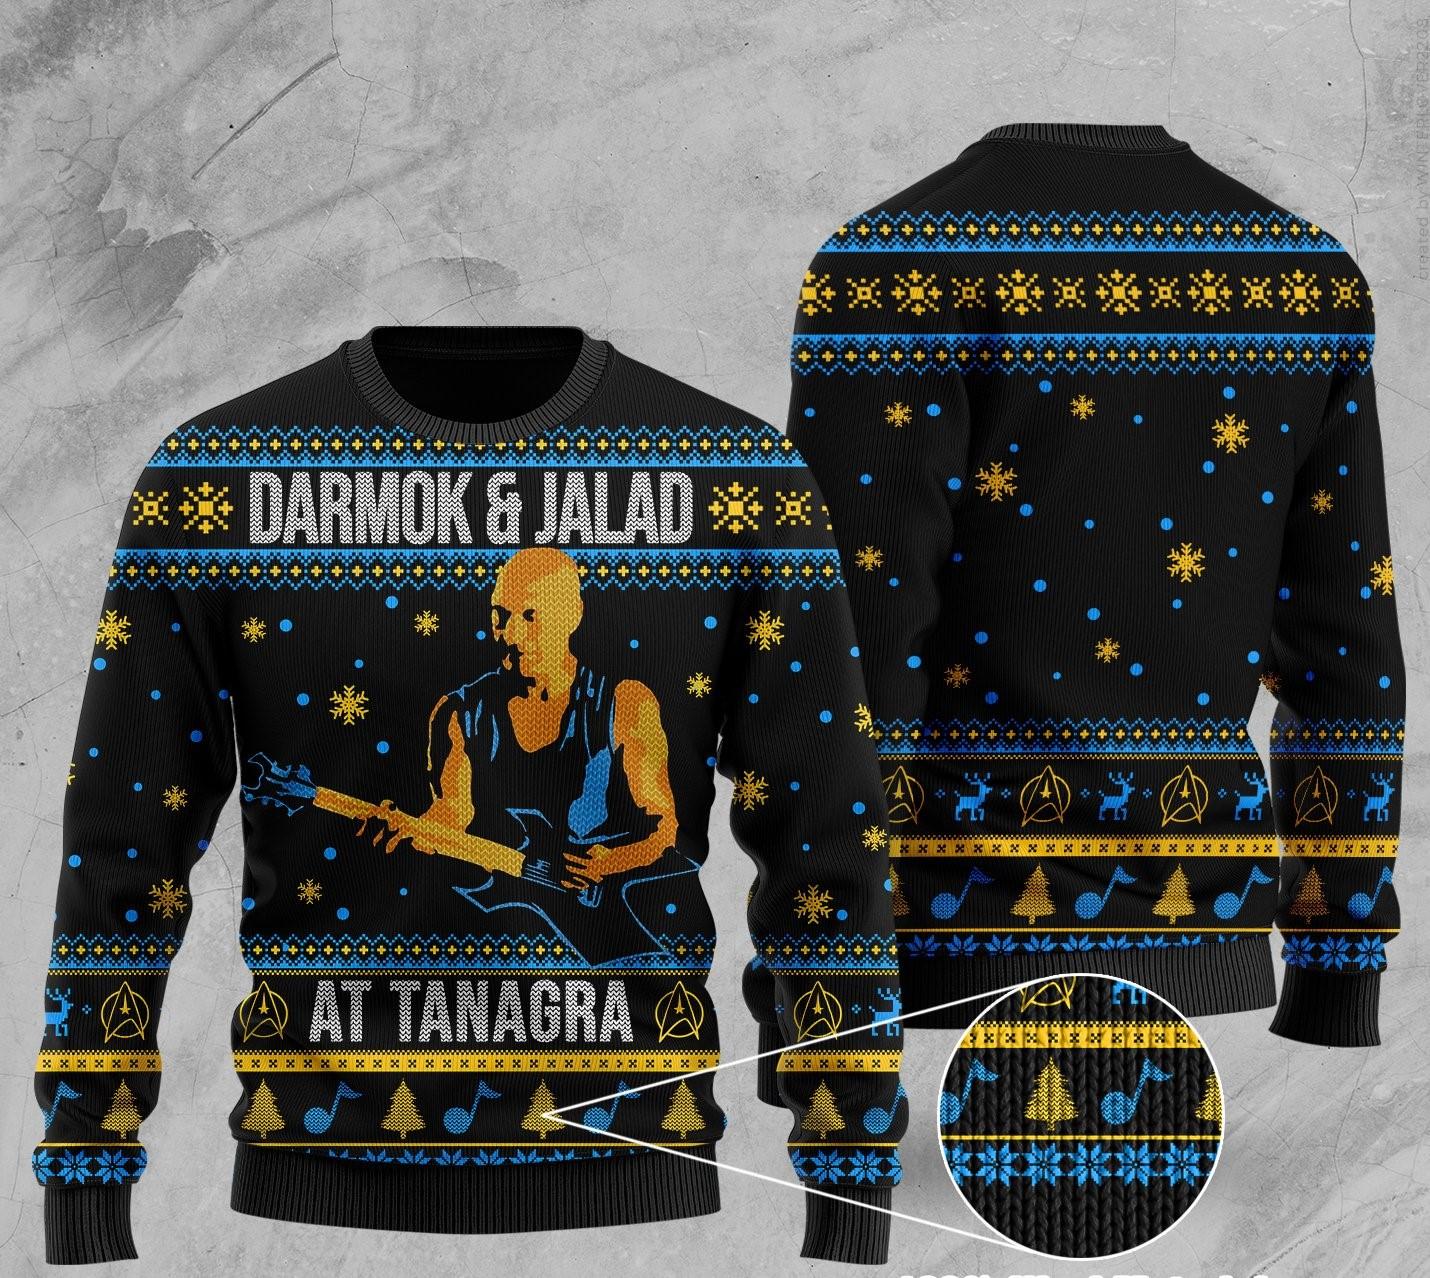 darmok and jalad at tanagra all over printed ugly christmas sweater 2 - Copy